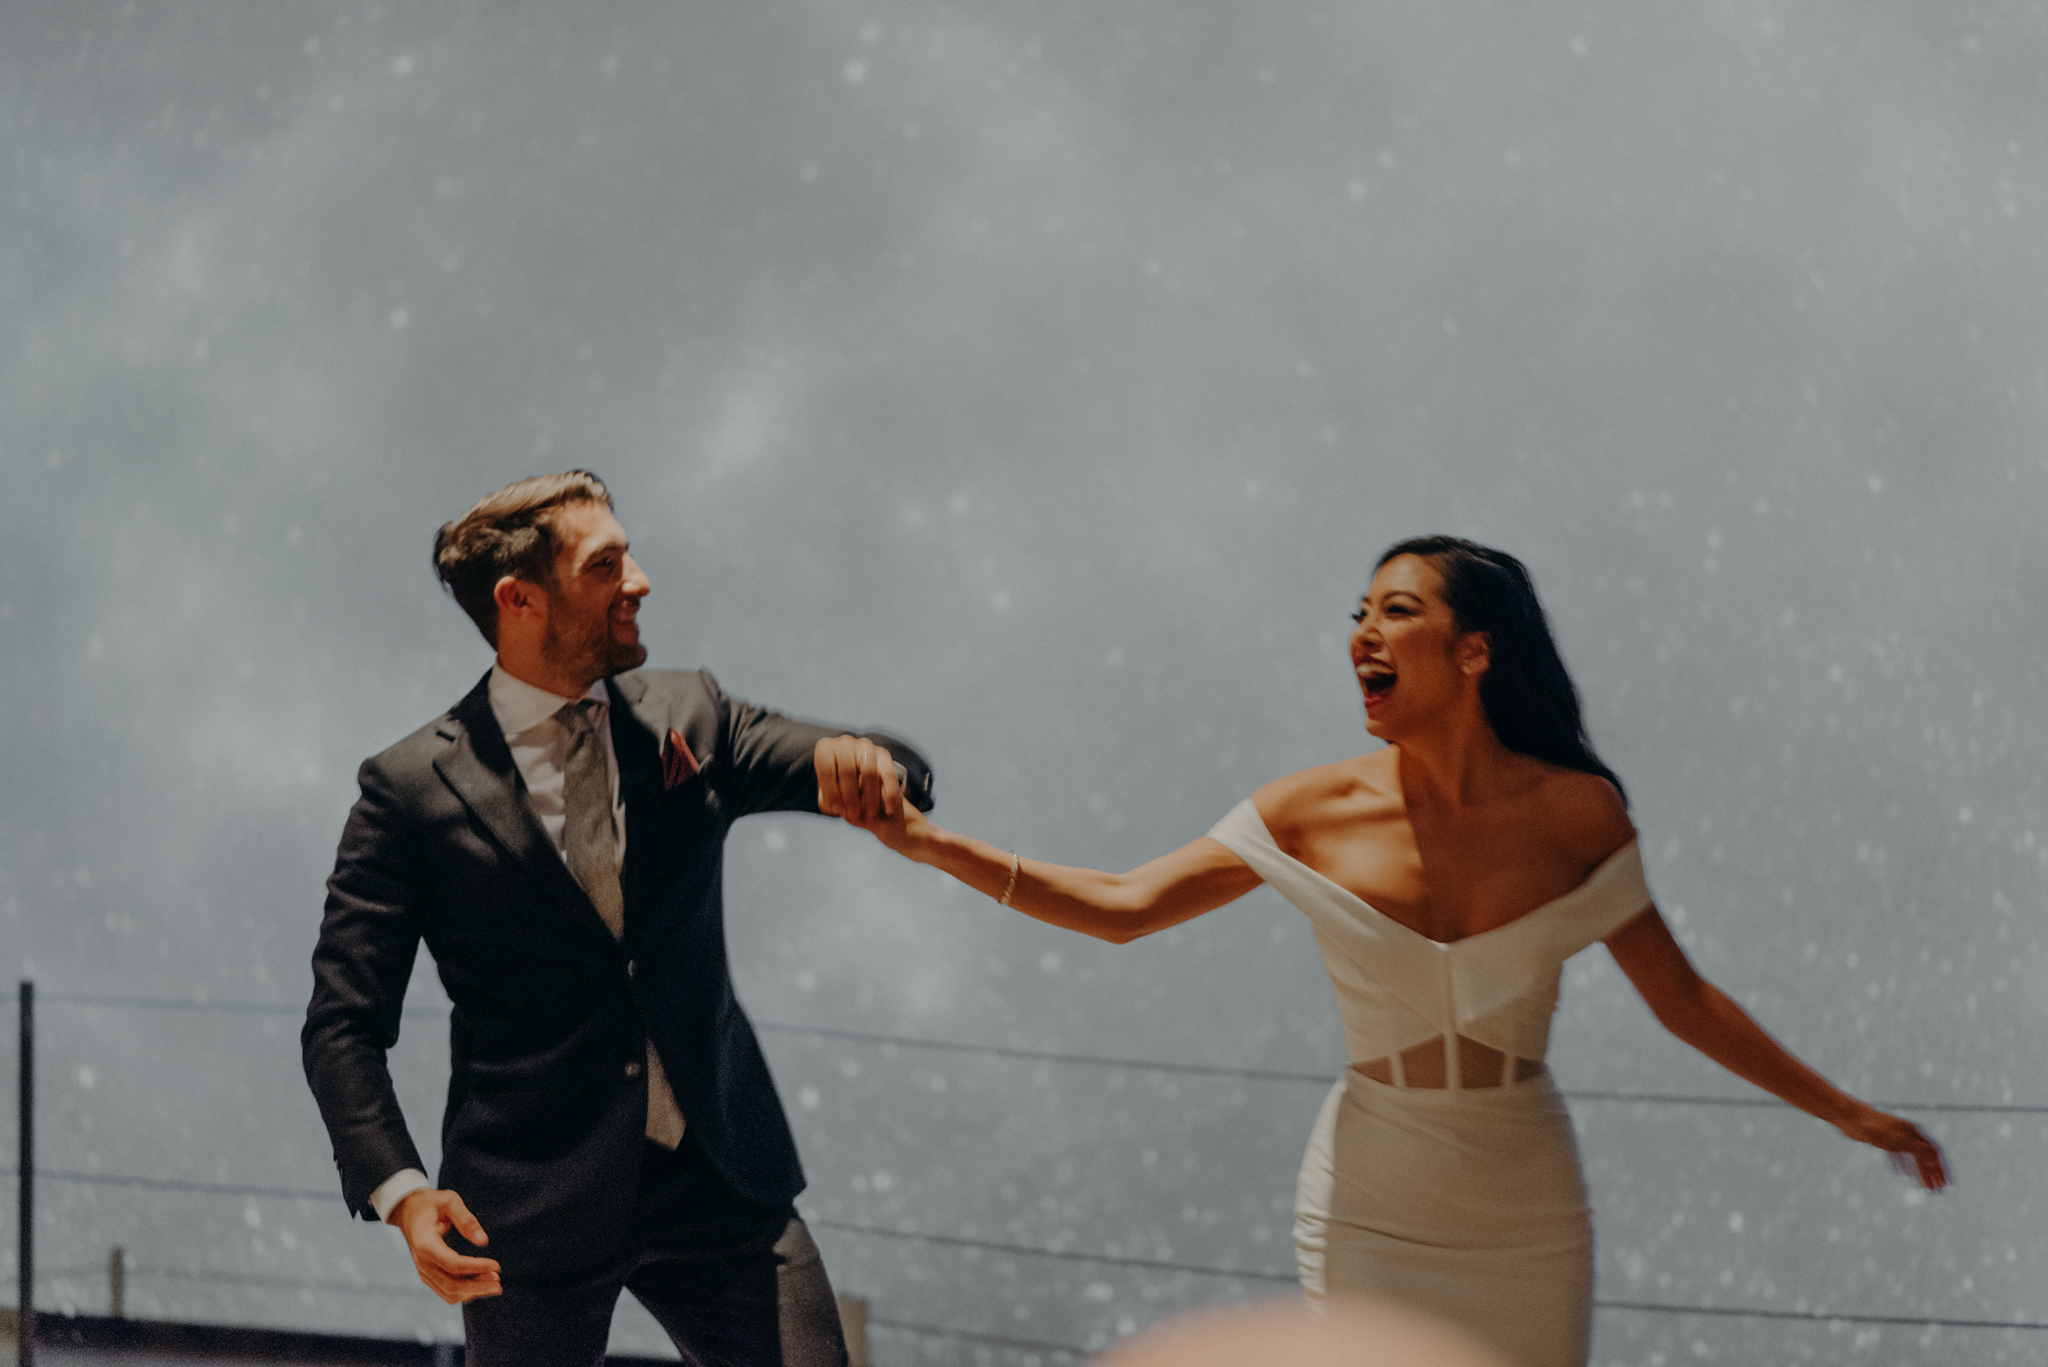 Wedding Photo LA - wedding photographer in los angeles - millwick wedding venue -isaiahandtaylor.com-118.jpg